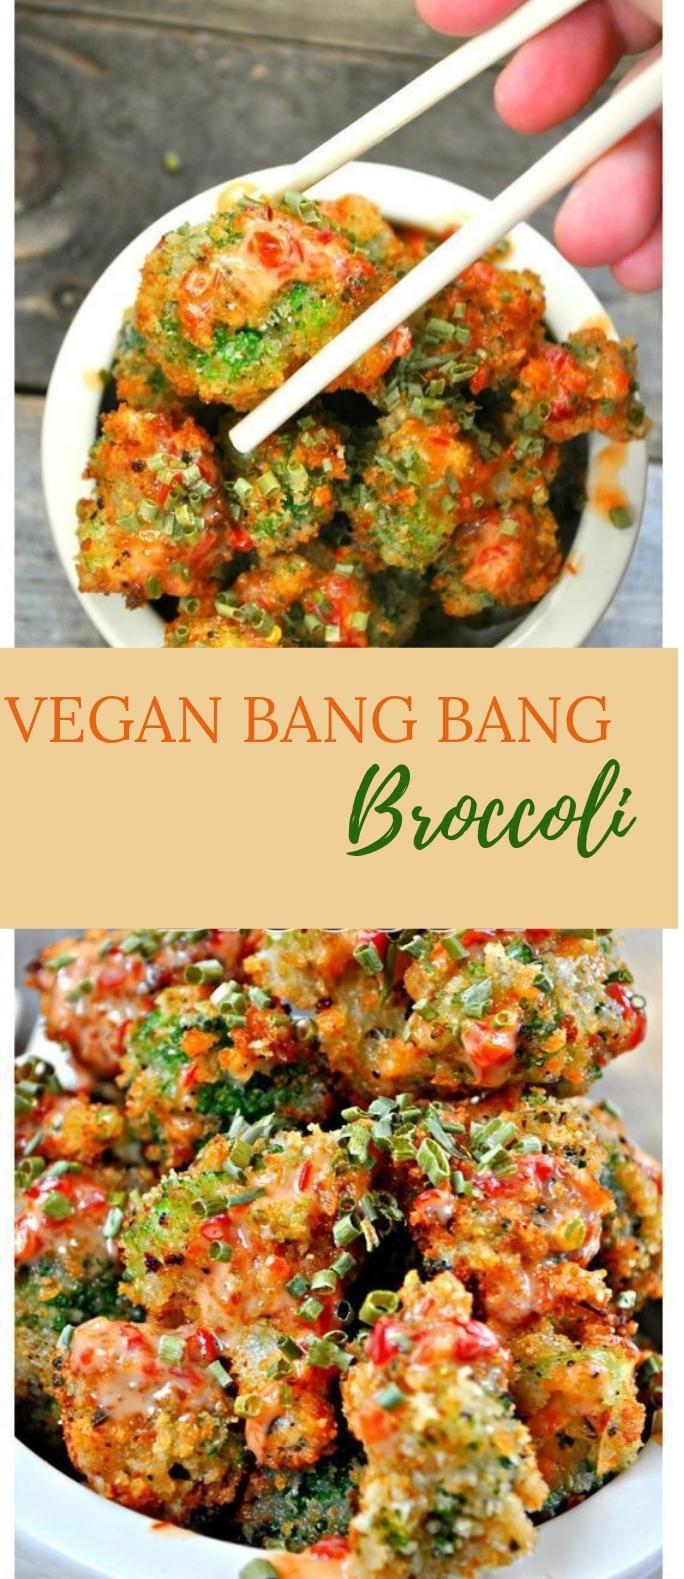 Vegan Bang Bang Broccoli #Delicious #Veganmeal